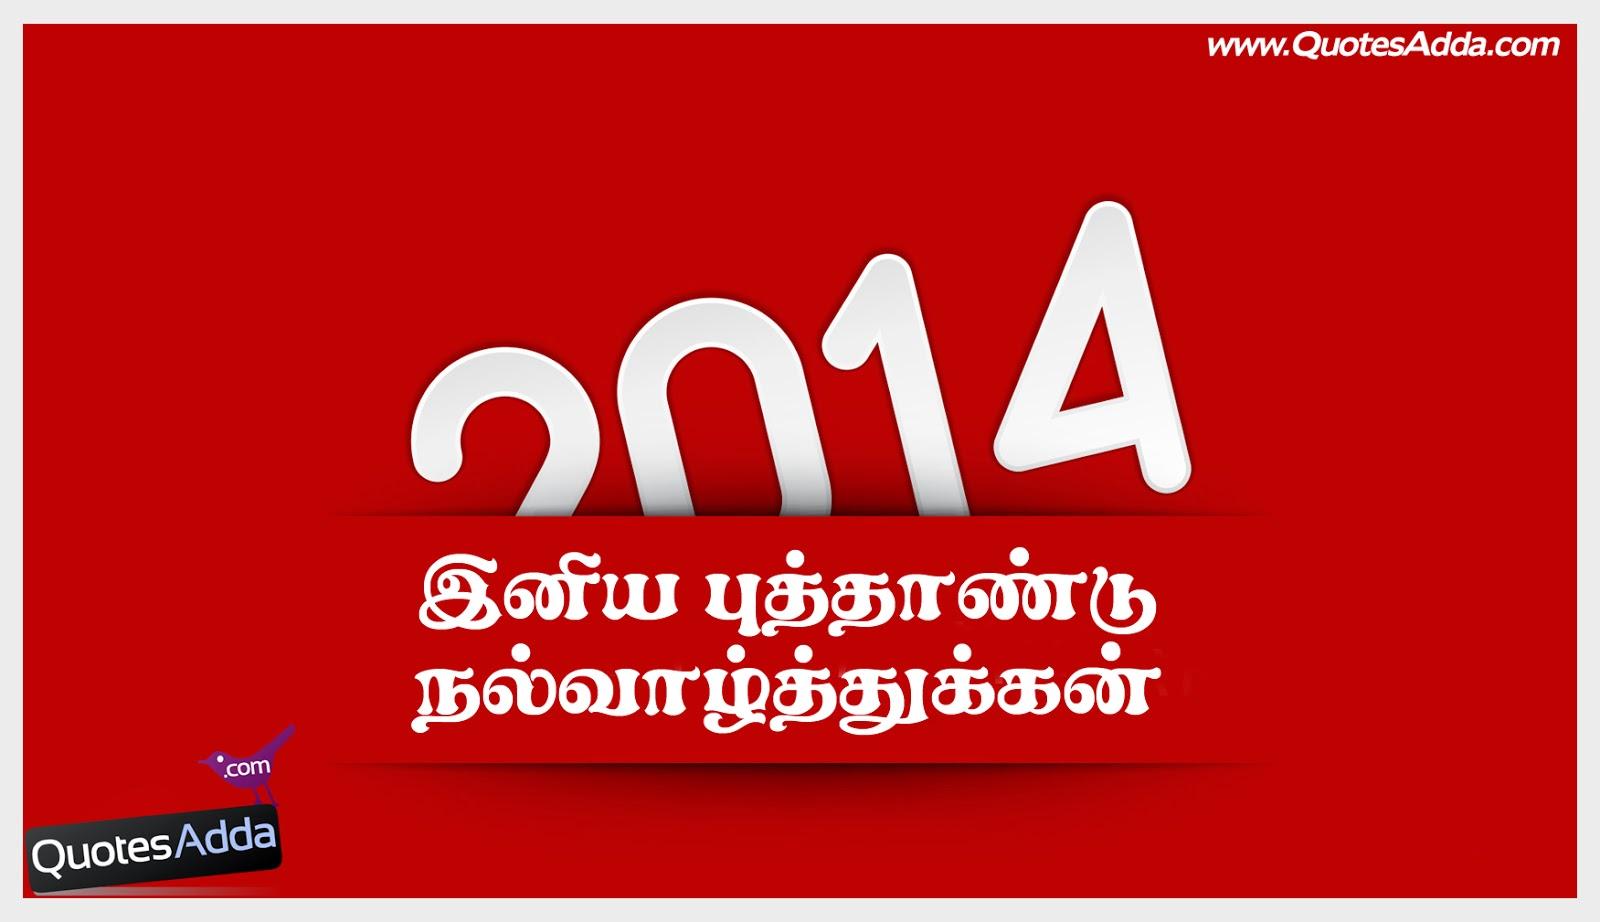 Tamil Kavithai In Tamil Httpwwwliupiscomtamiltamilkavithai